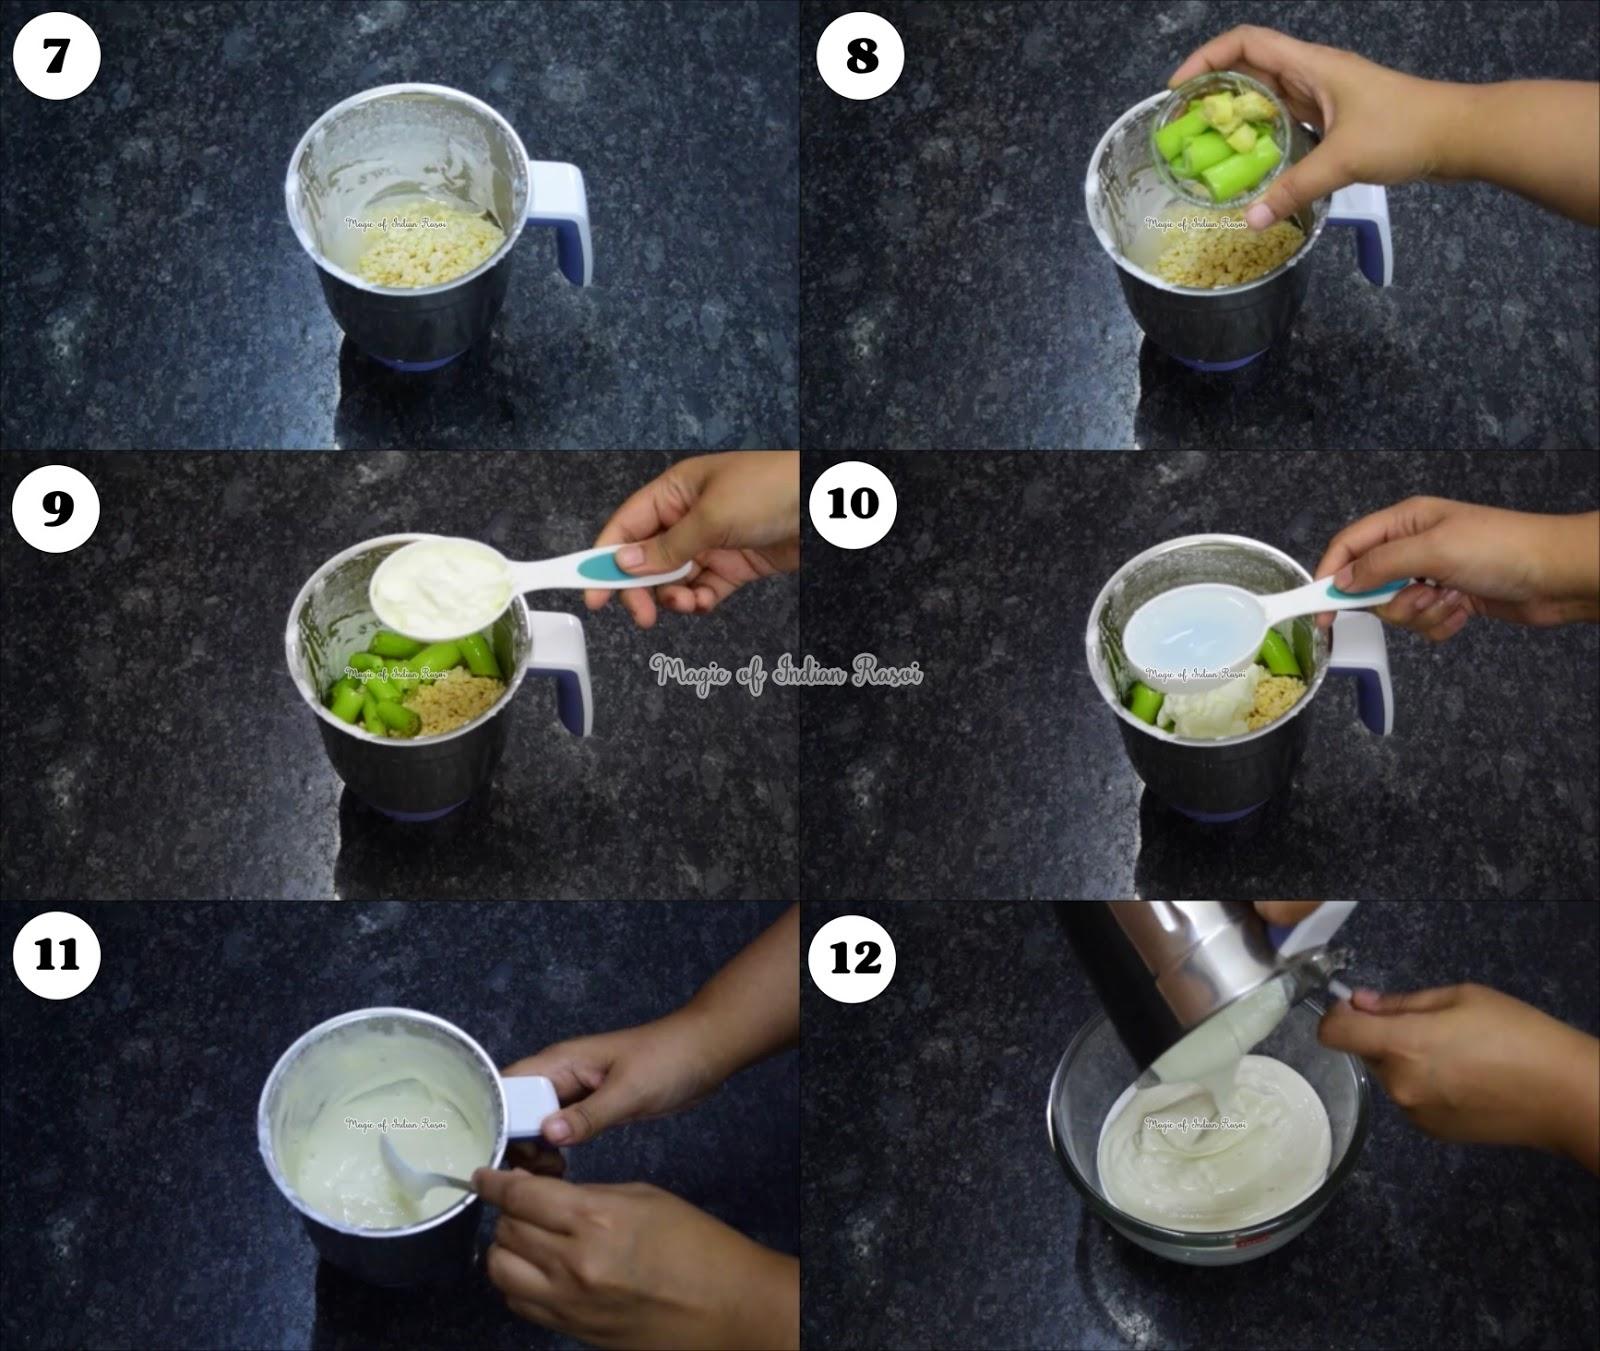 Idla - White Dhokla - Famous Gujarati Farsan Recipe - इडला - व्हाइट ढोकळा - प्रसिद्ध गुजराती फरसाण रेसिपी - Priya R - Magic of Indian Rasoi